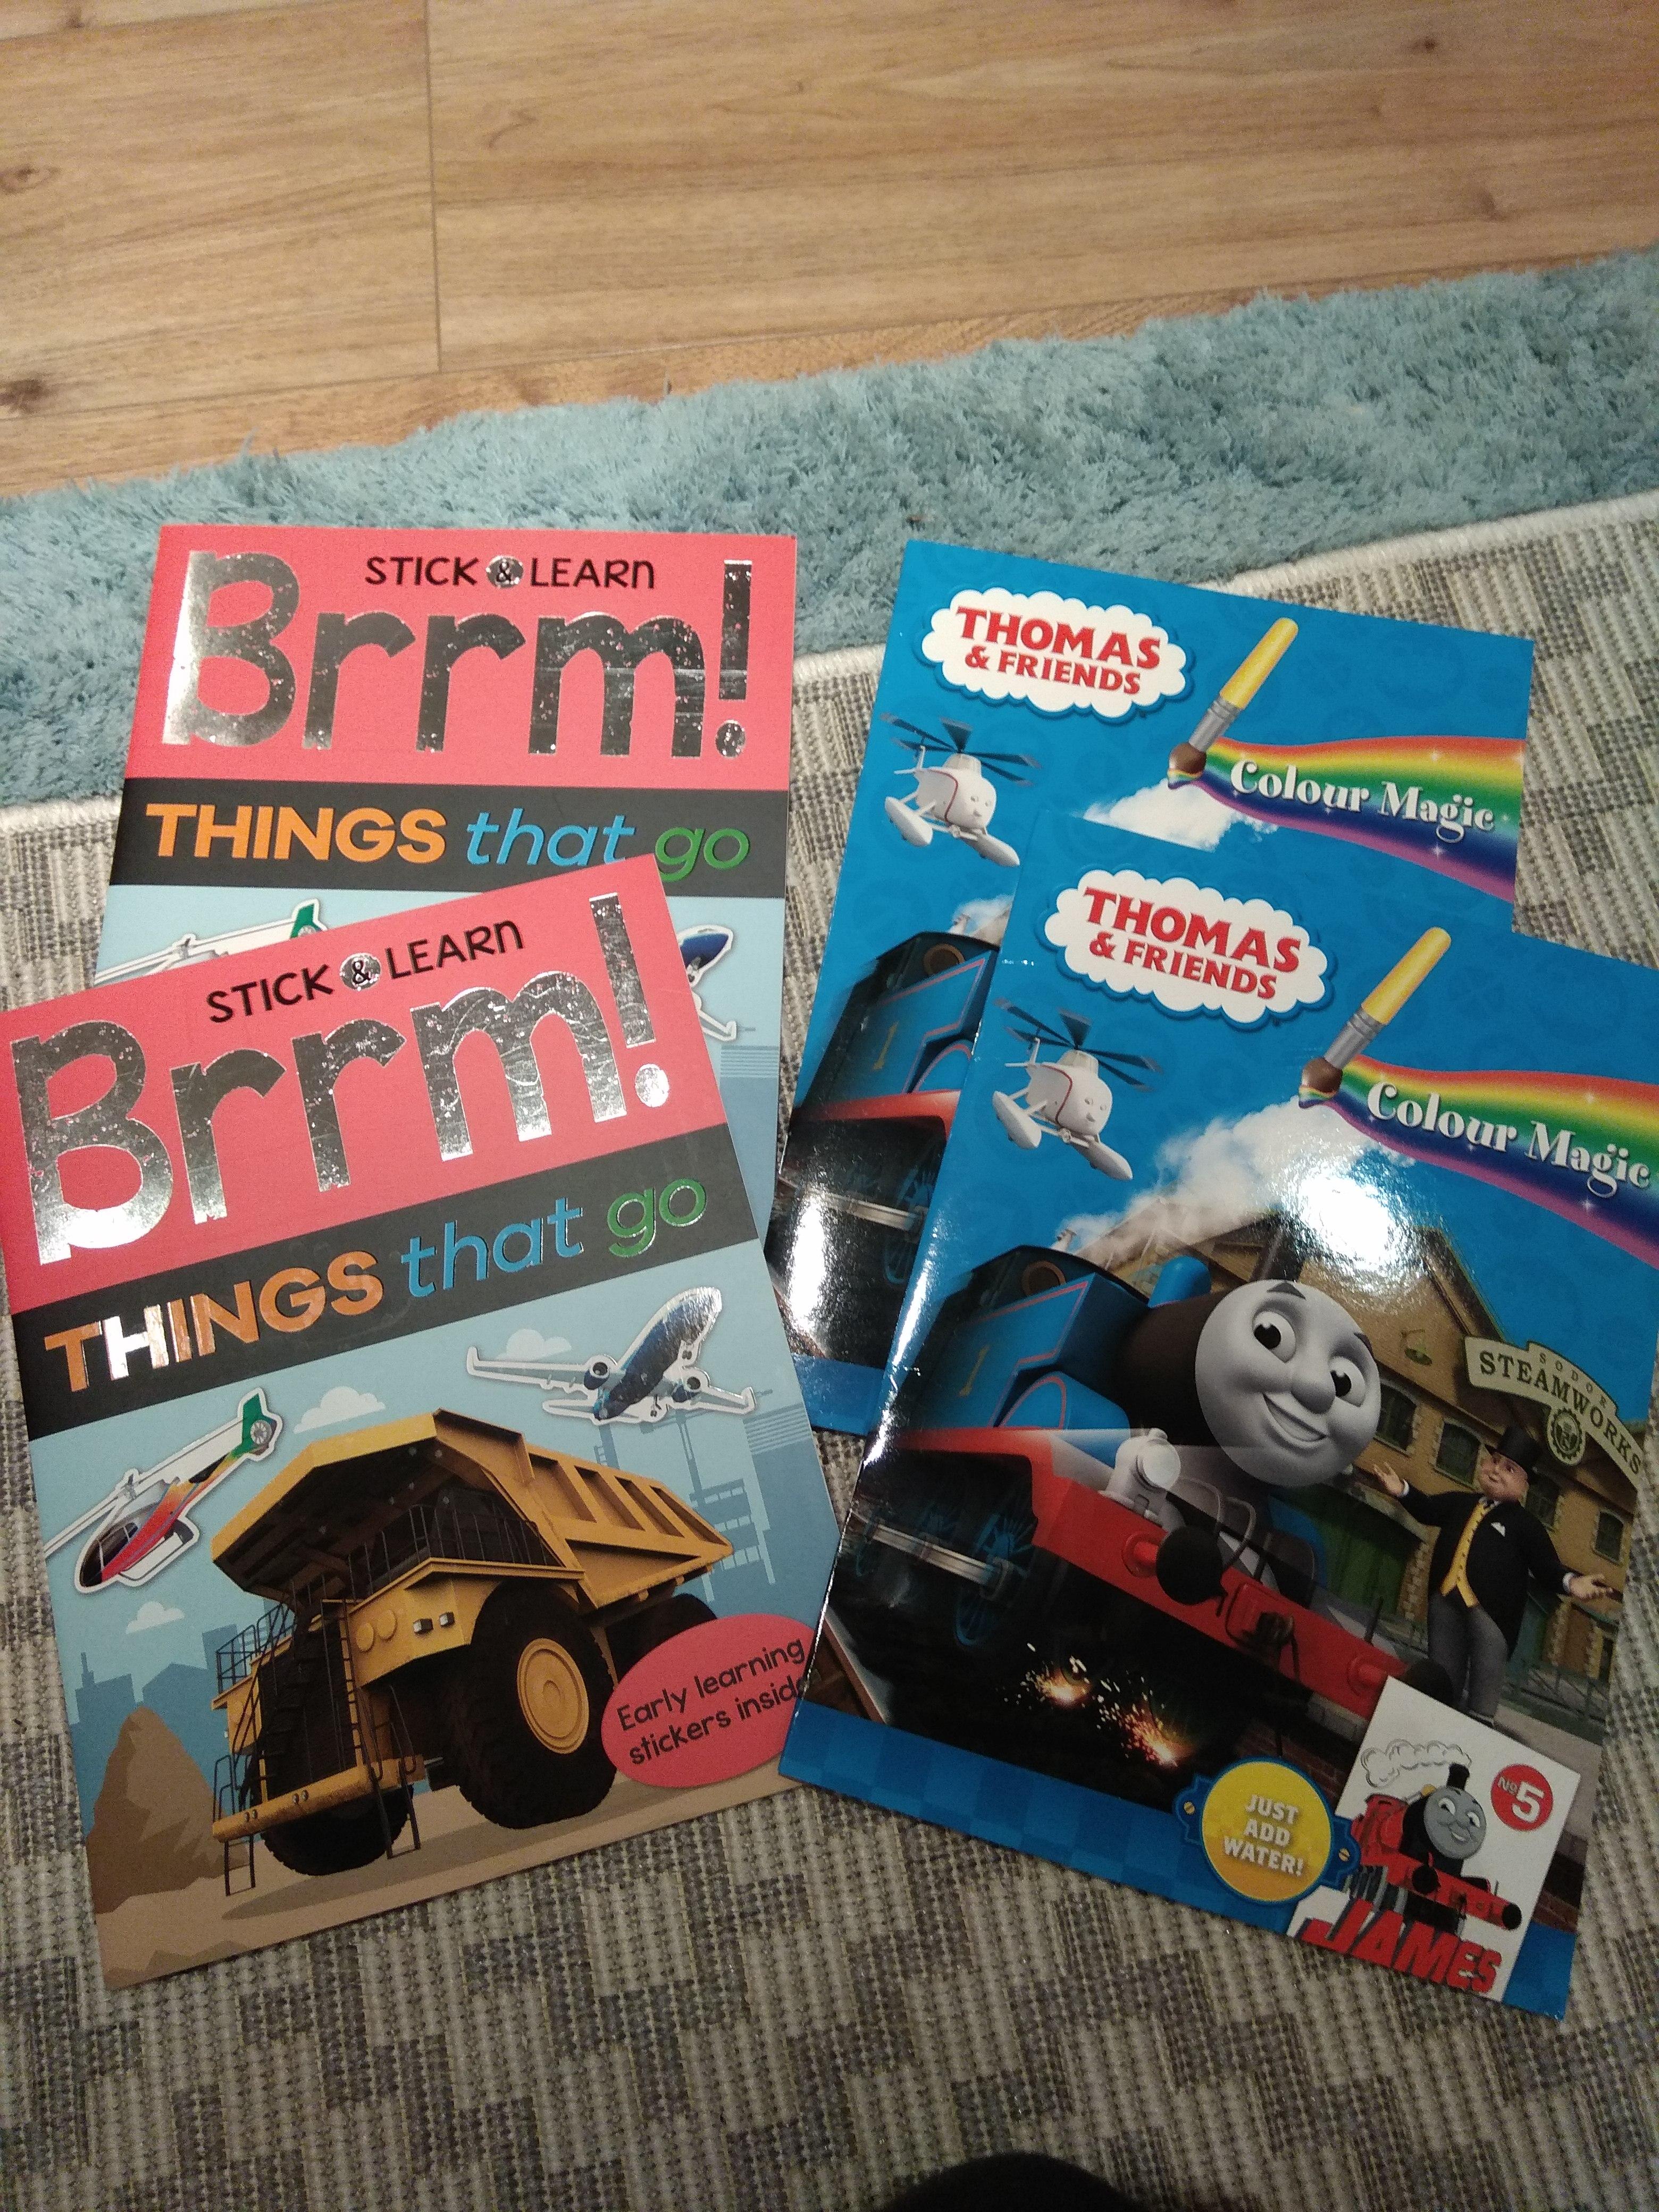 Kids Activity Books £1 @ Poundland including Thomas & Friends Colour Magic